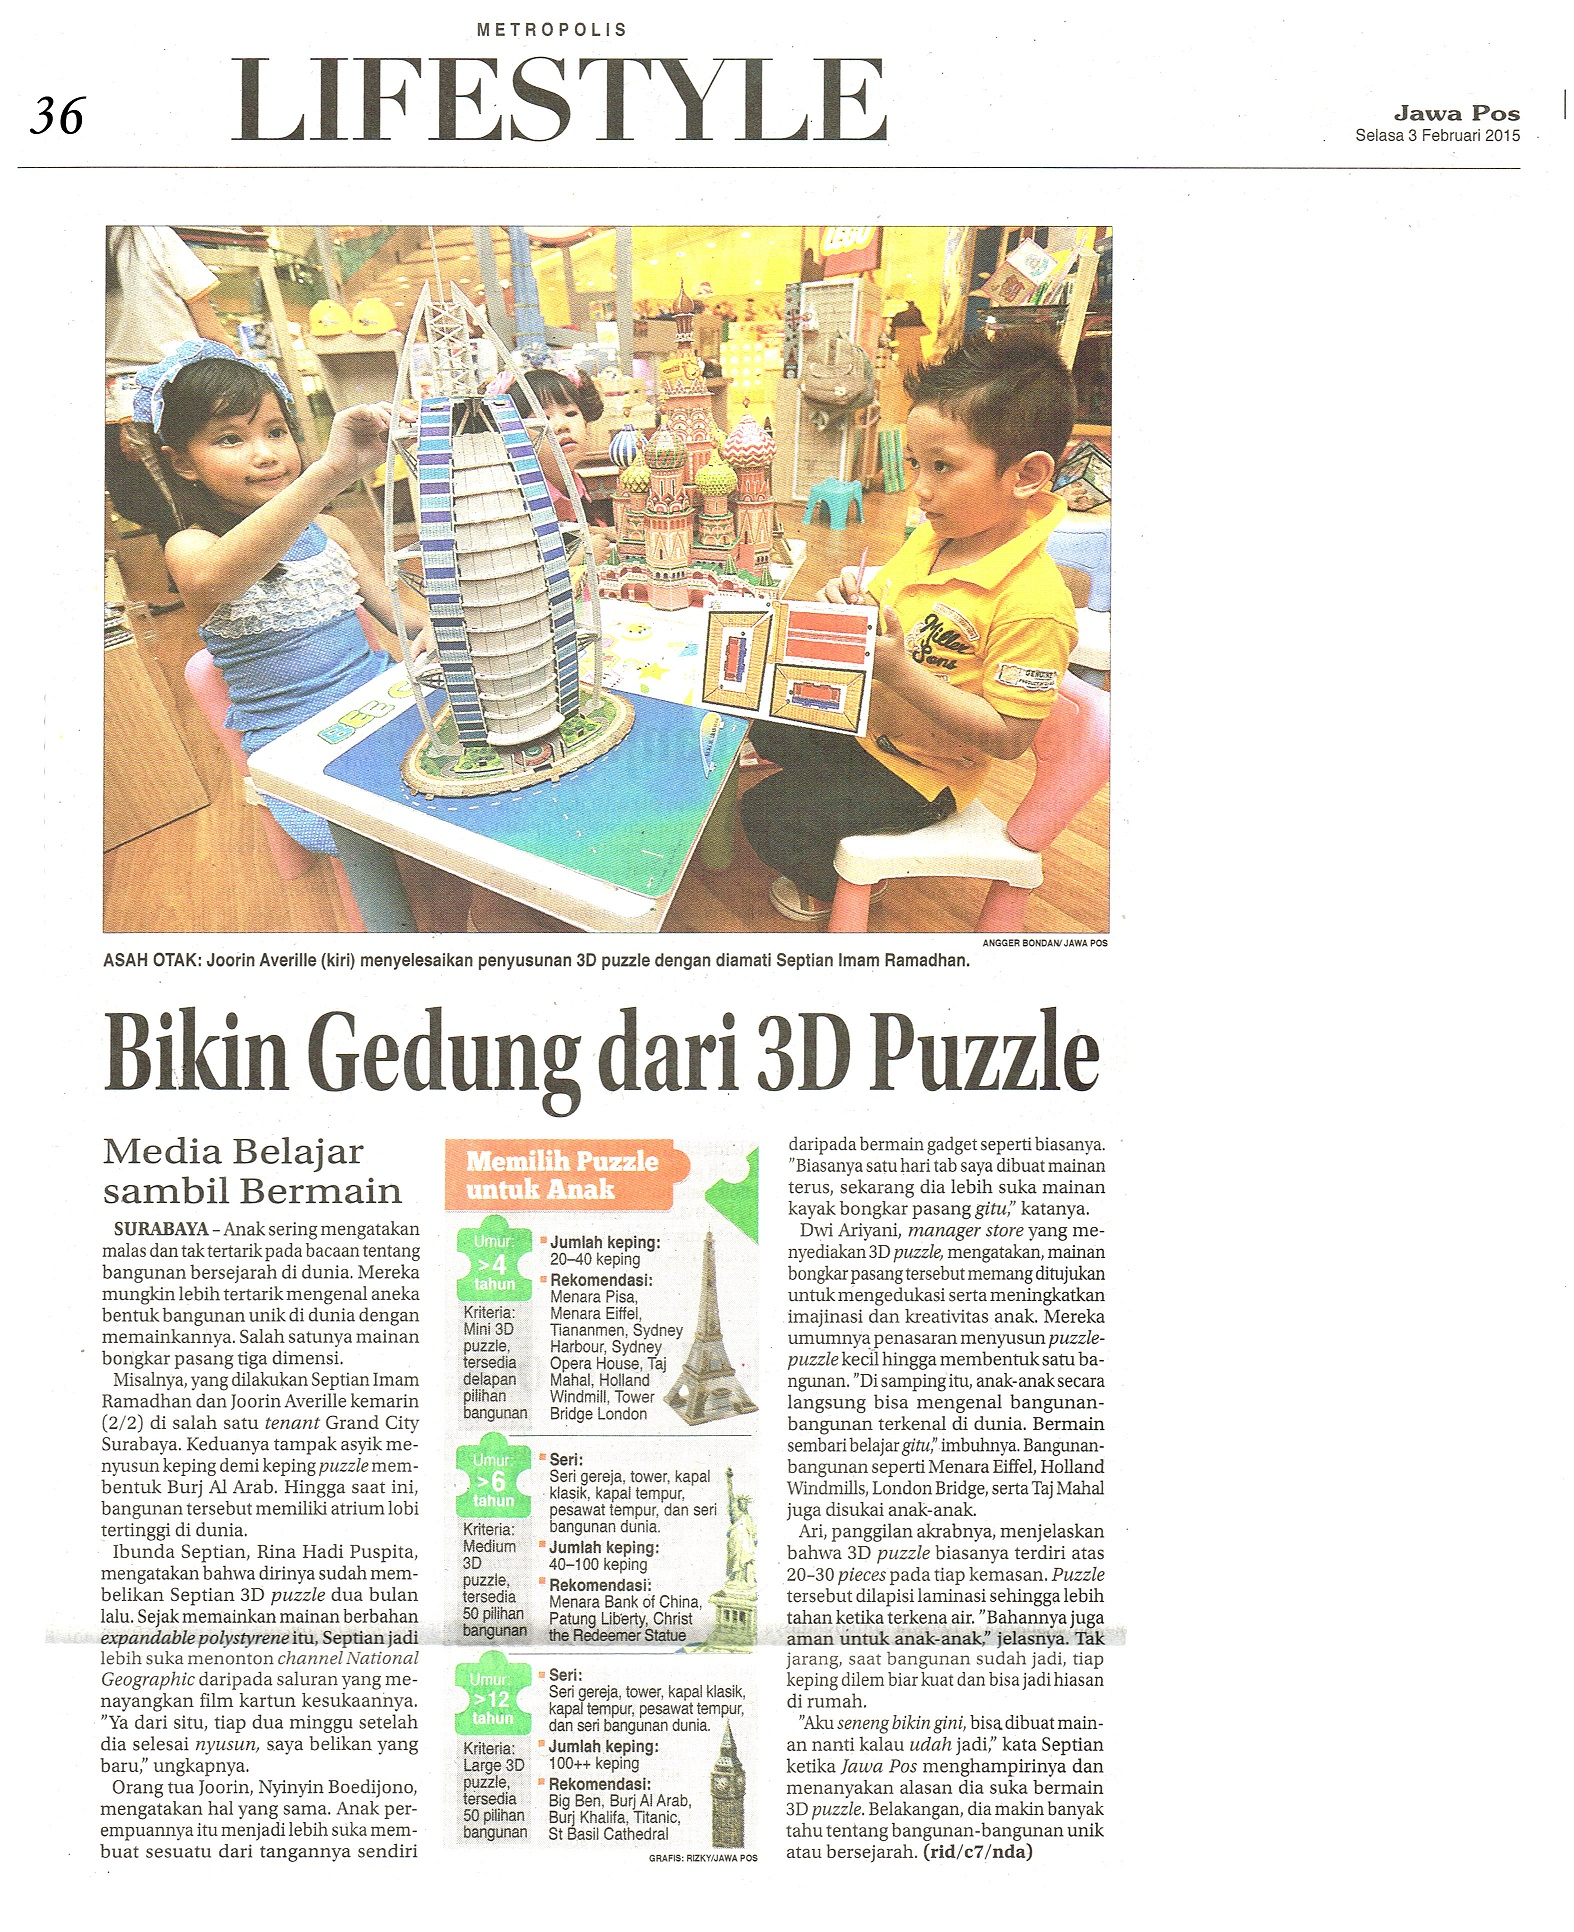 Bikin Gedung dari 3D Puzzle. Jawa Pos.3 Februari 2015.Hal.36